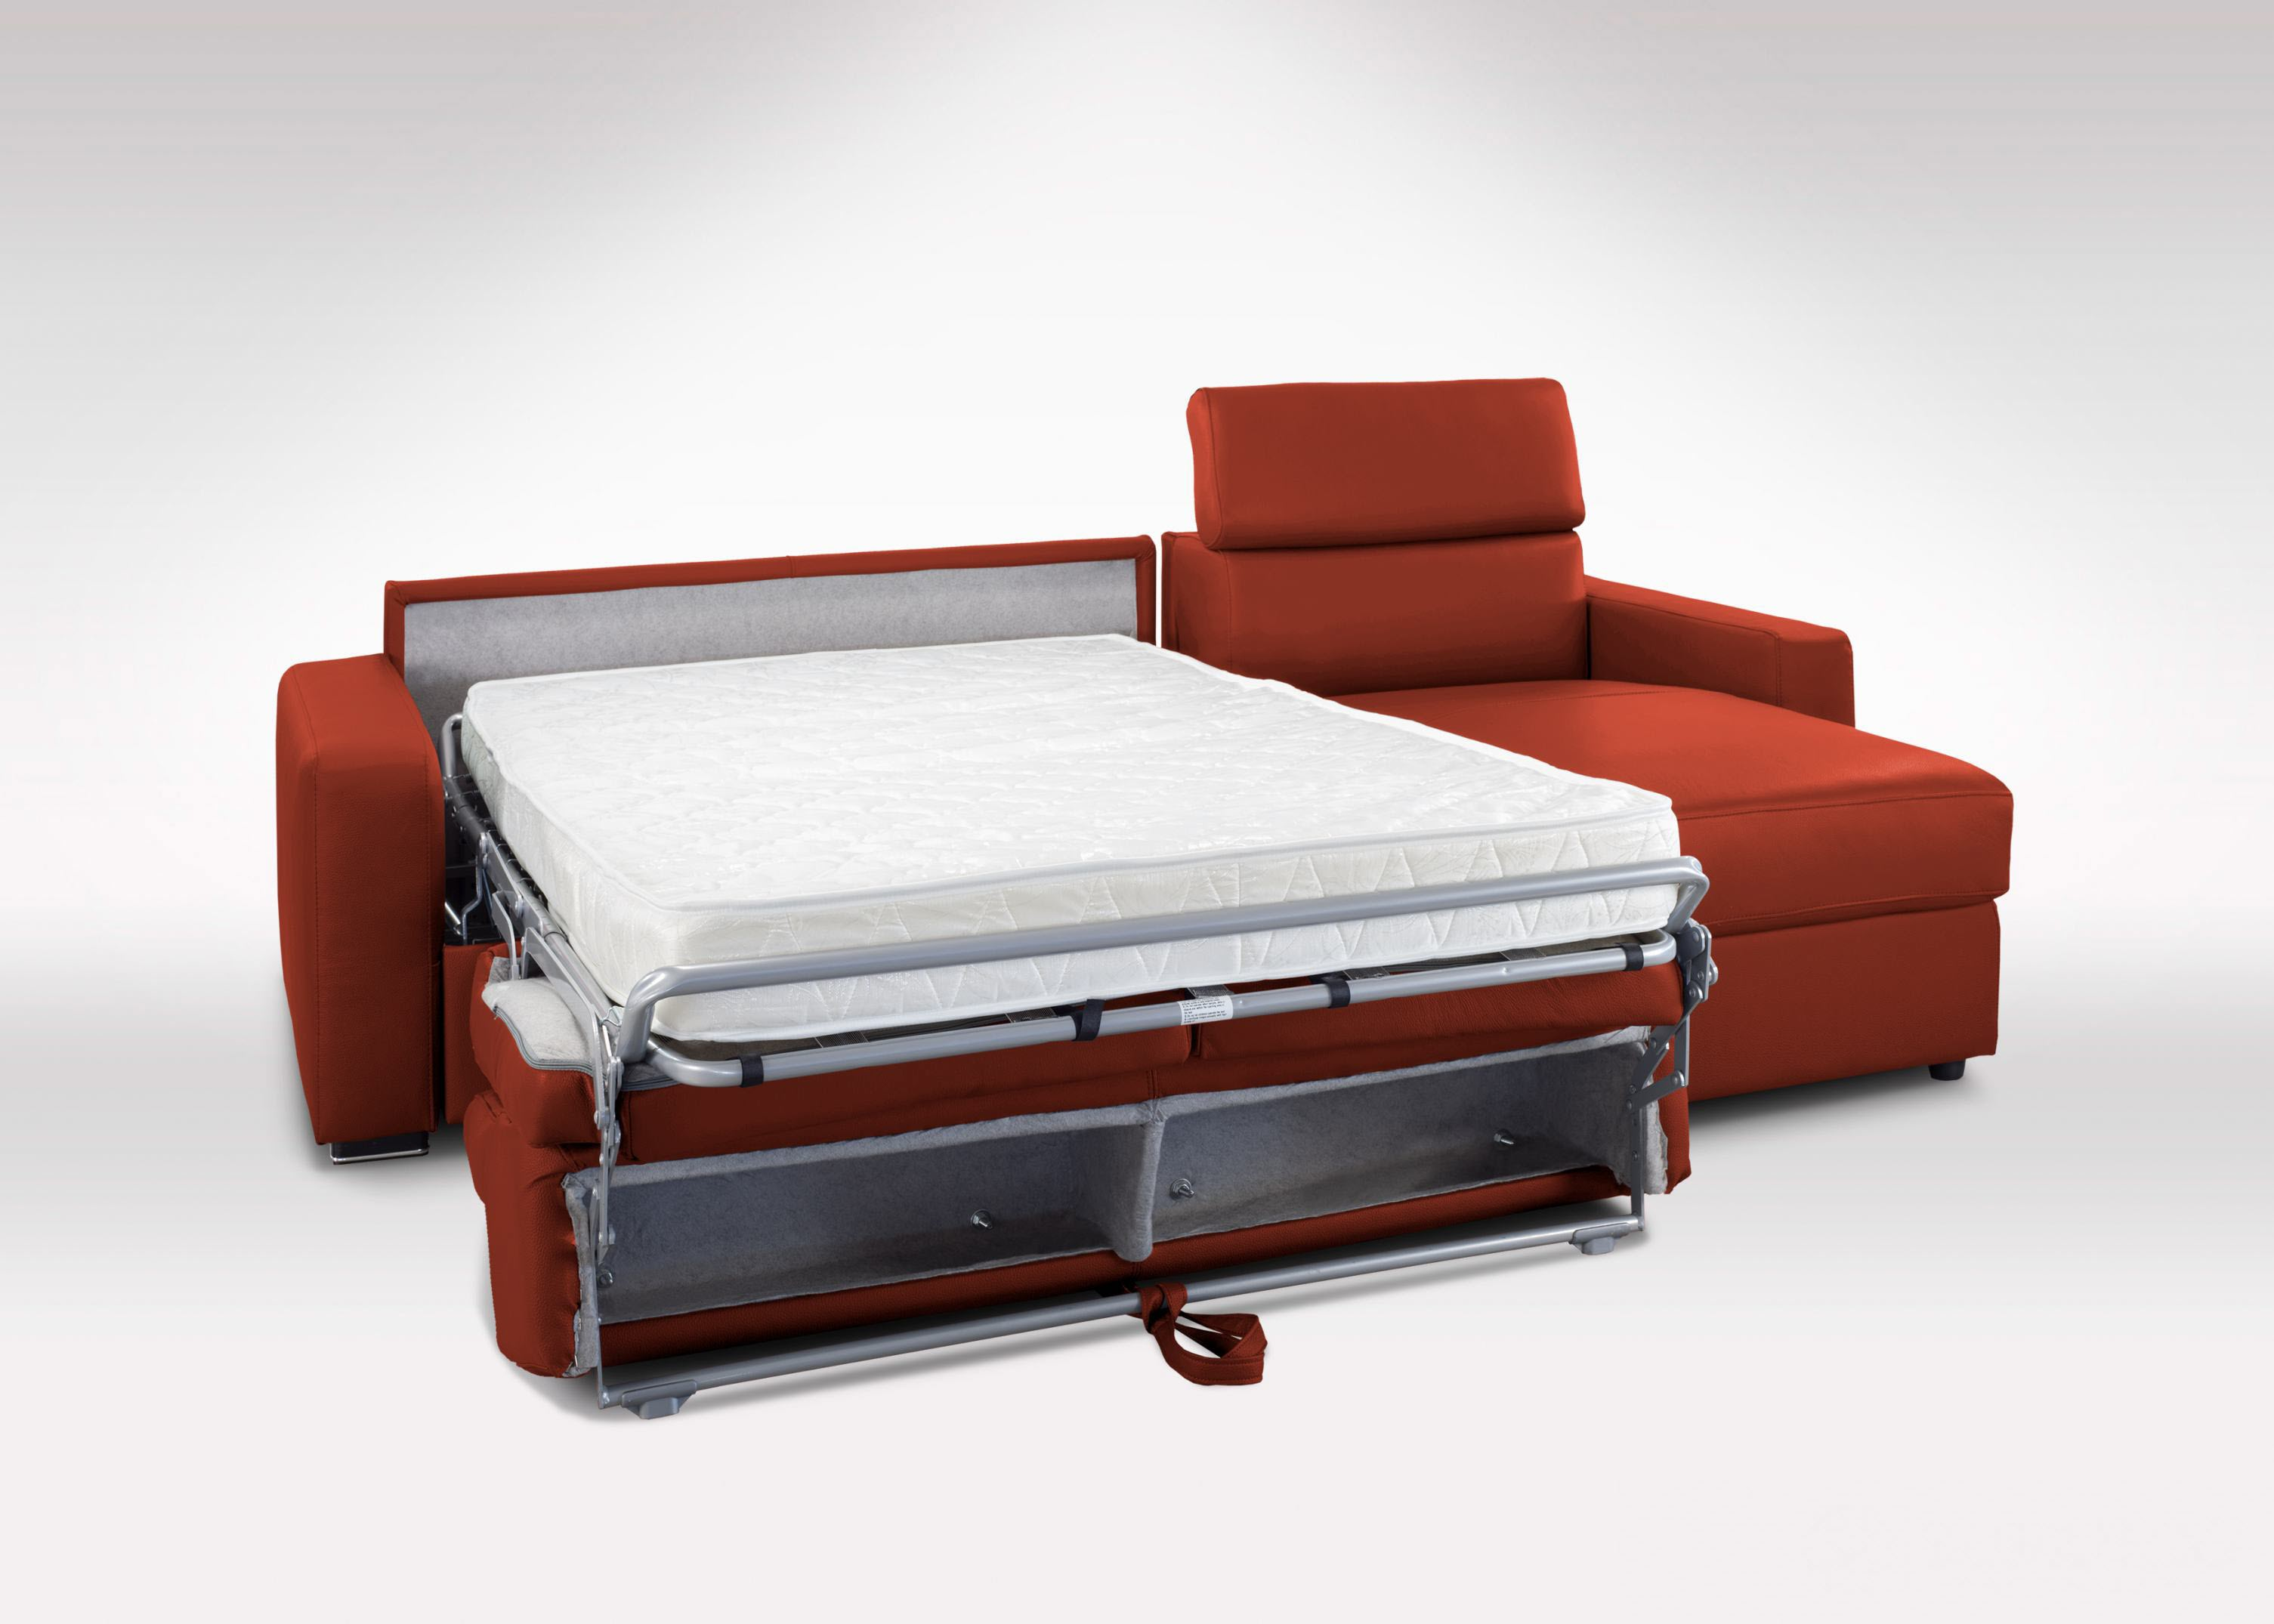 Reve ספה פינתית נפתחת למיטה